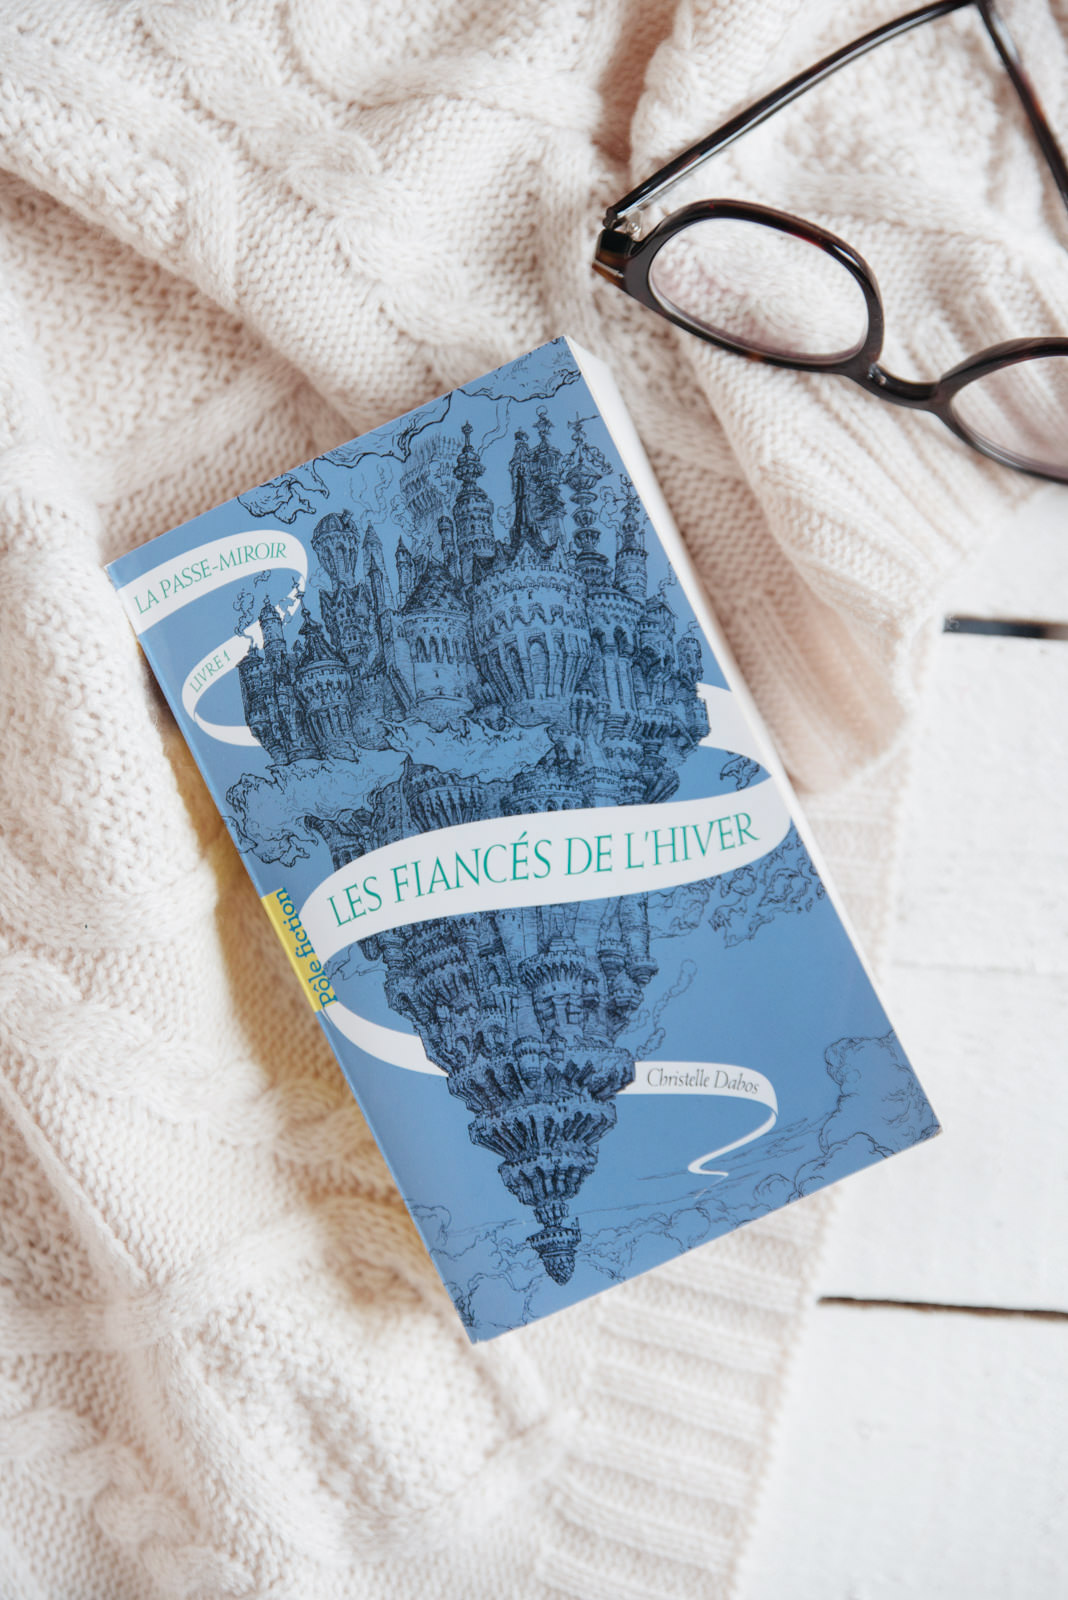 Blog-Mode-And-The-City-Lifestyle-livre-fiances-hiver-avis